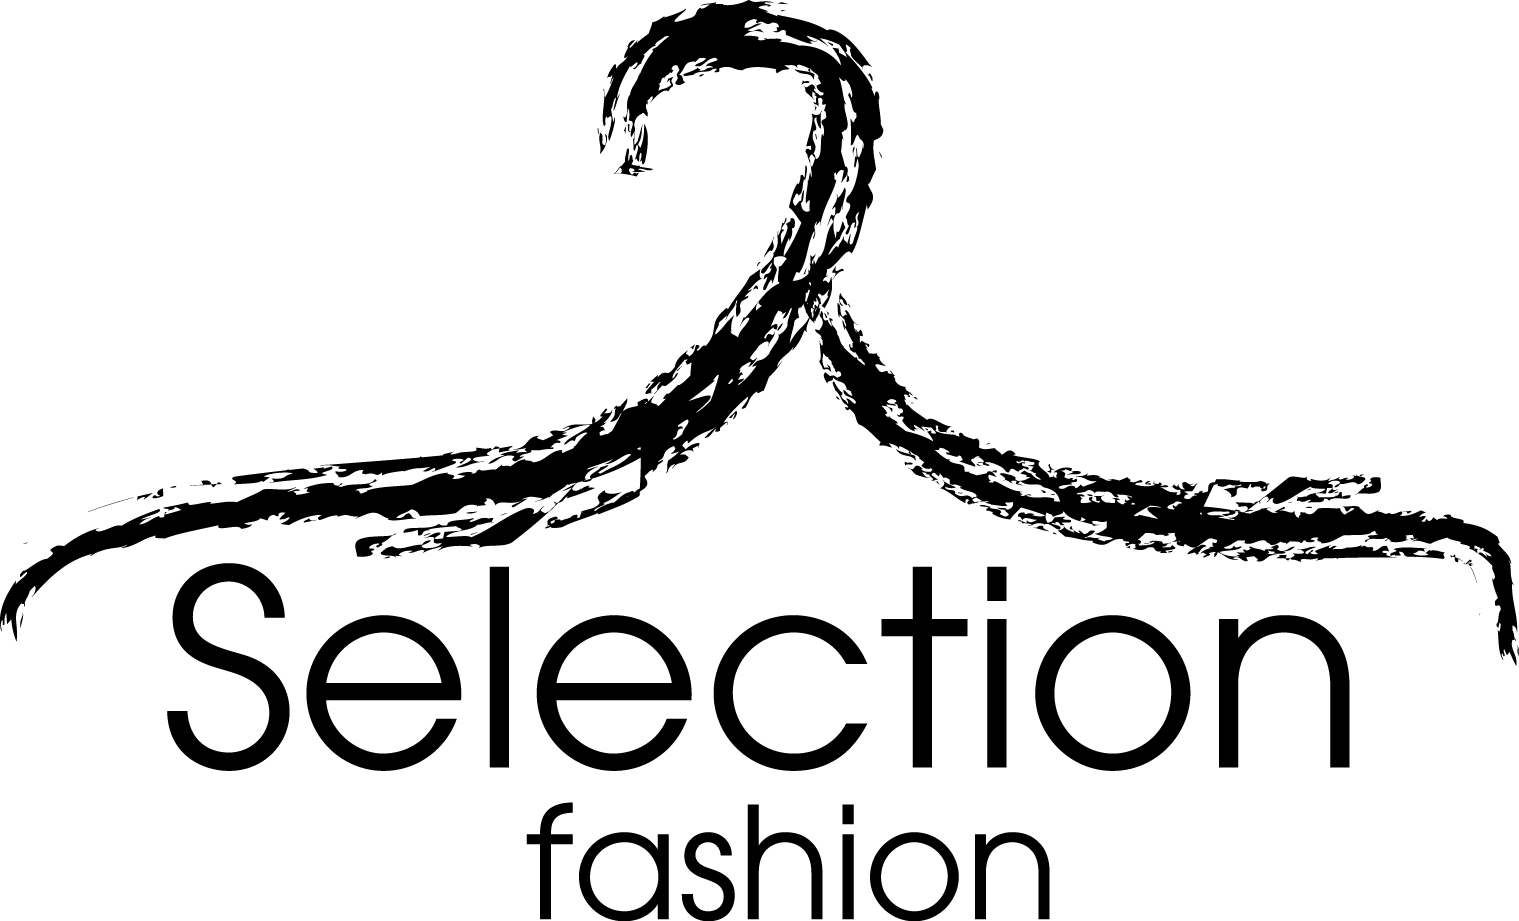 Selection Fashion